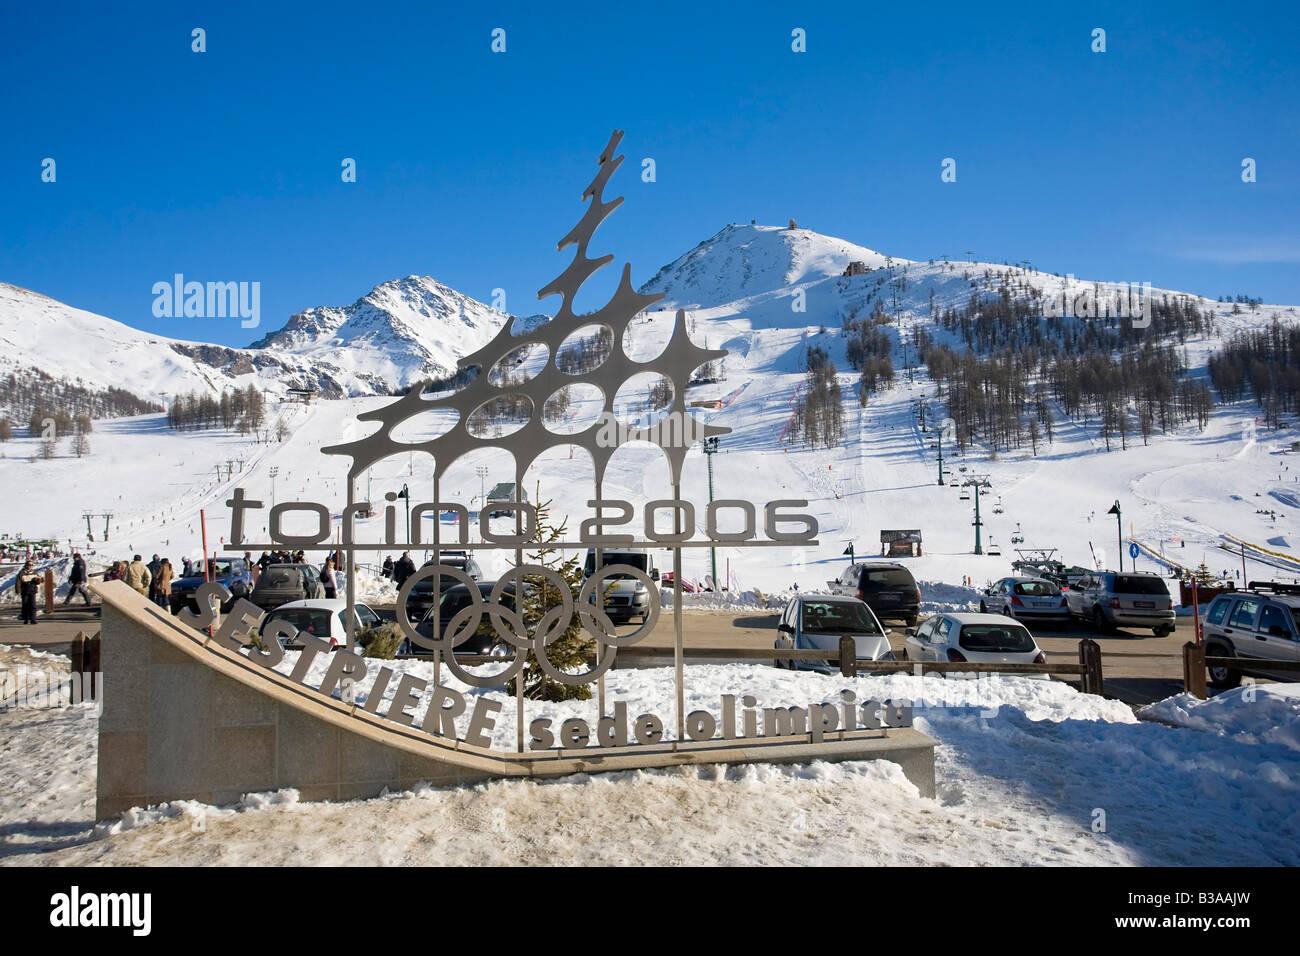 Turin 2006 Winter Olympics Logo Sestriere Province Piedmont Italy